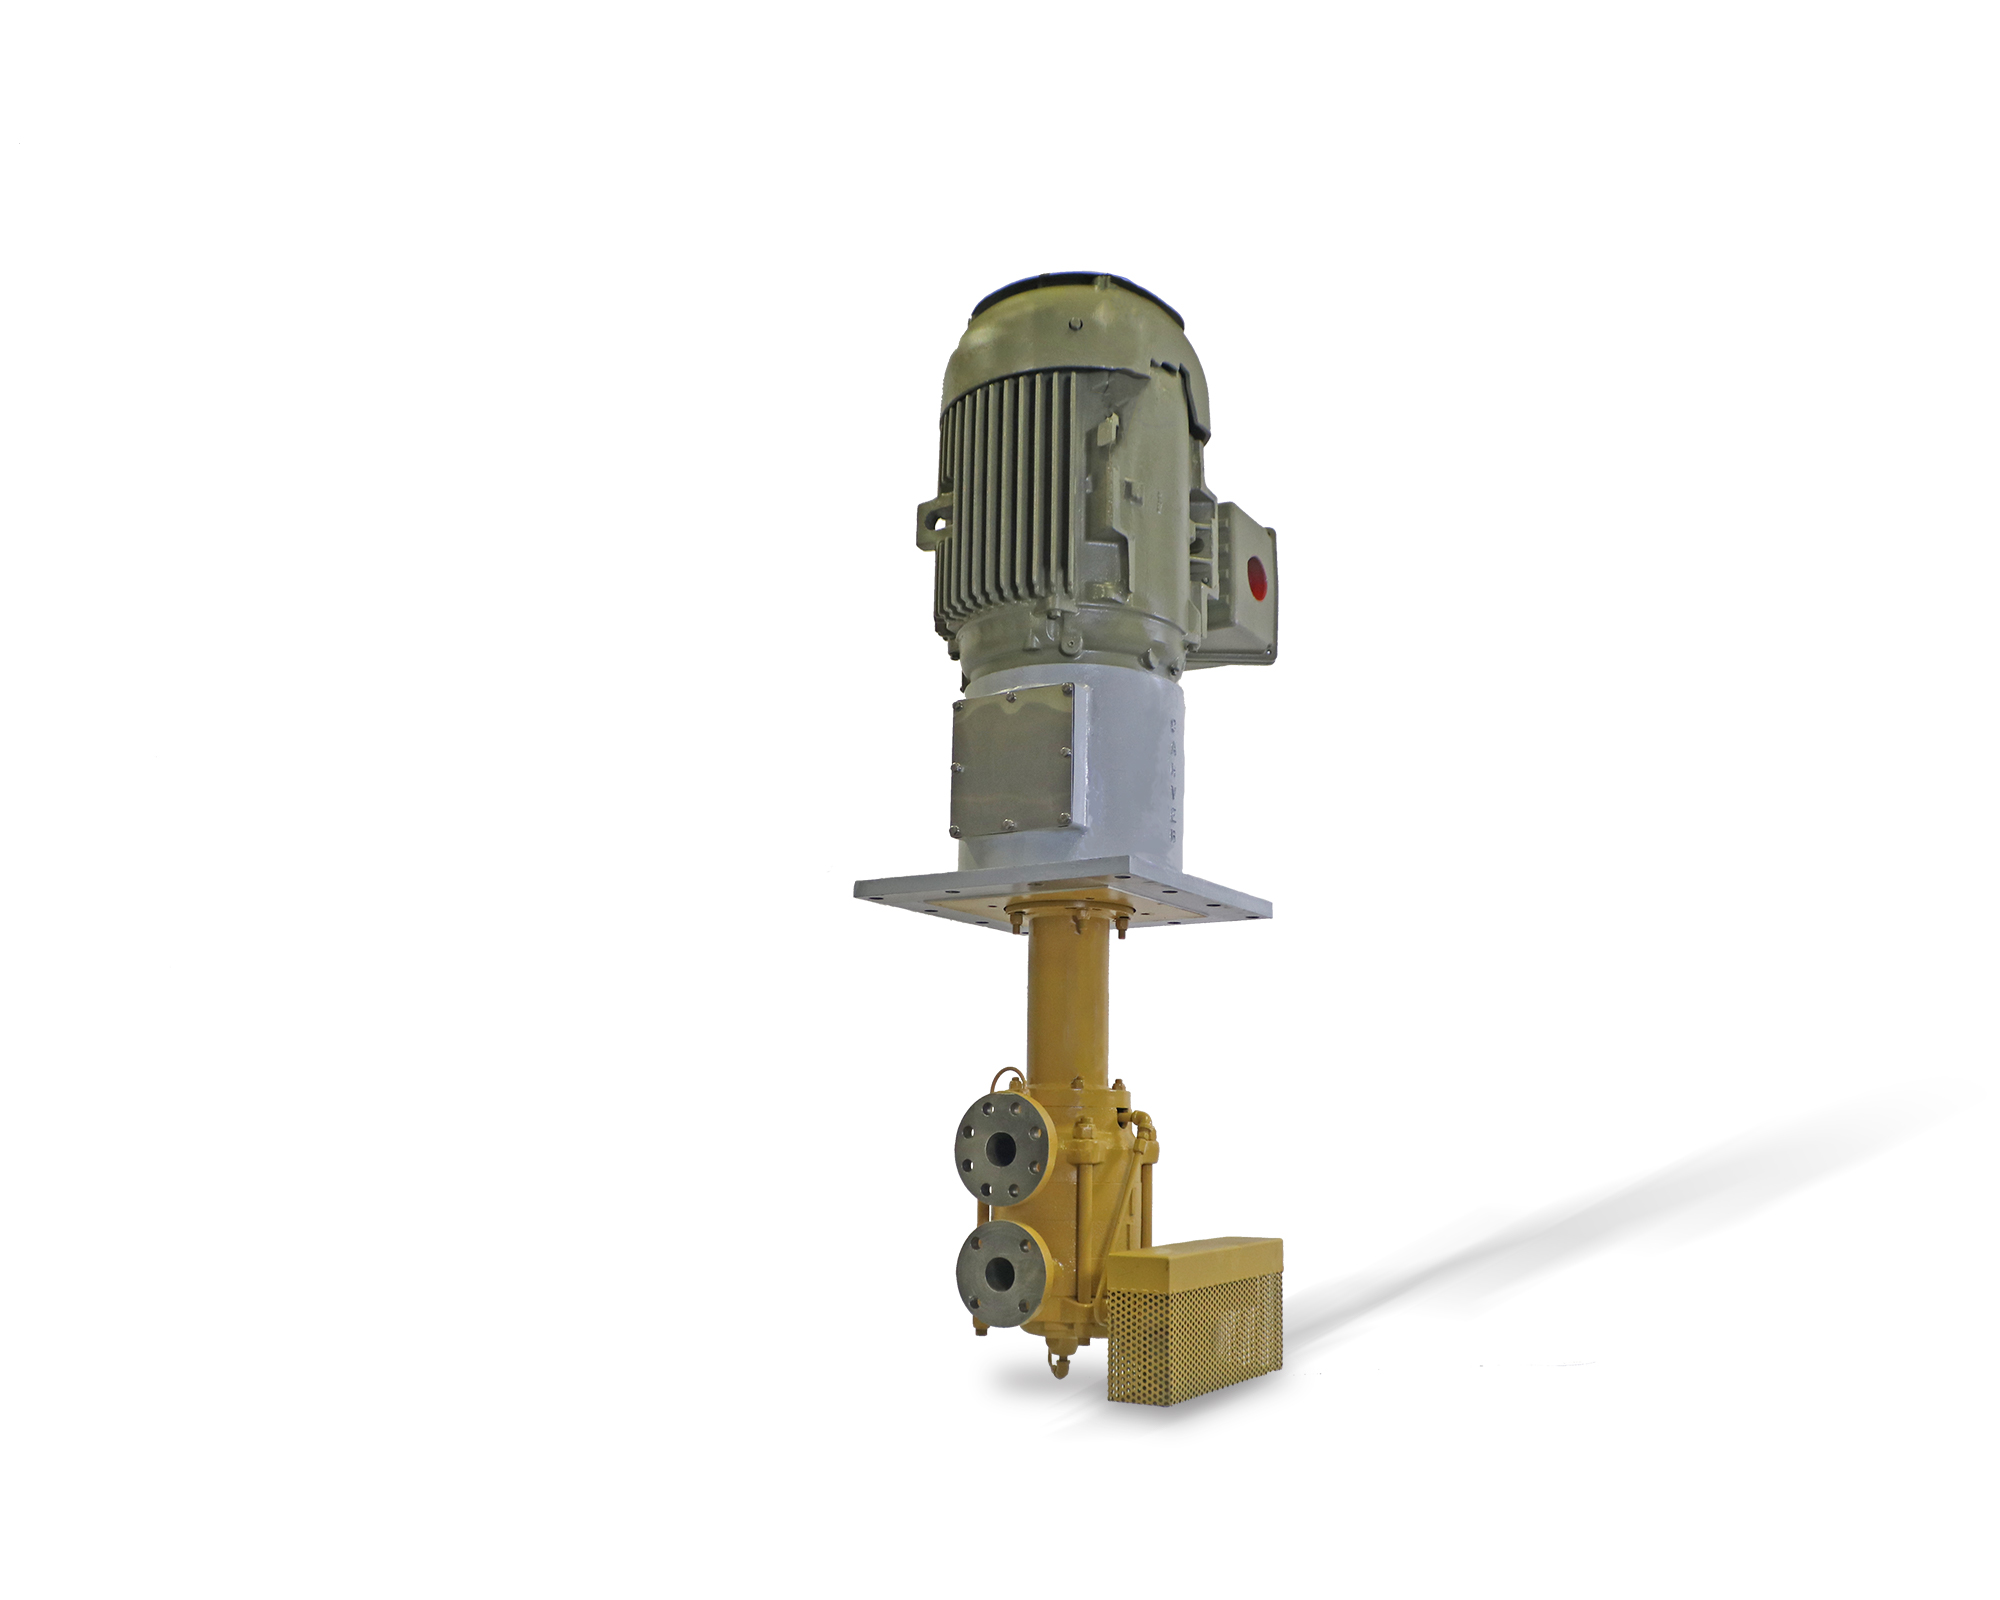 Vlo Carver Pump